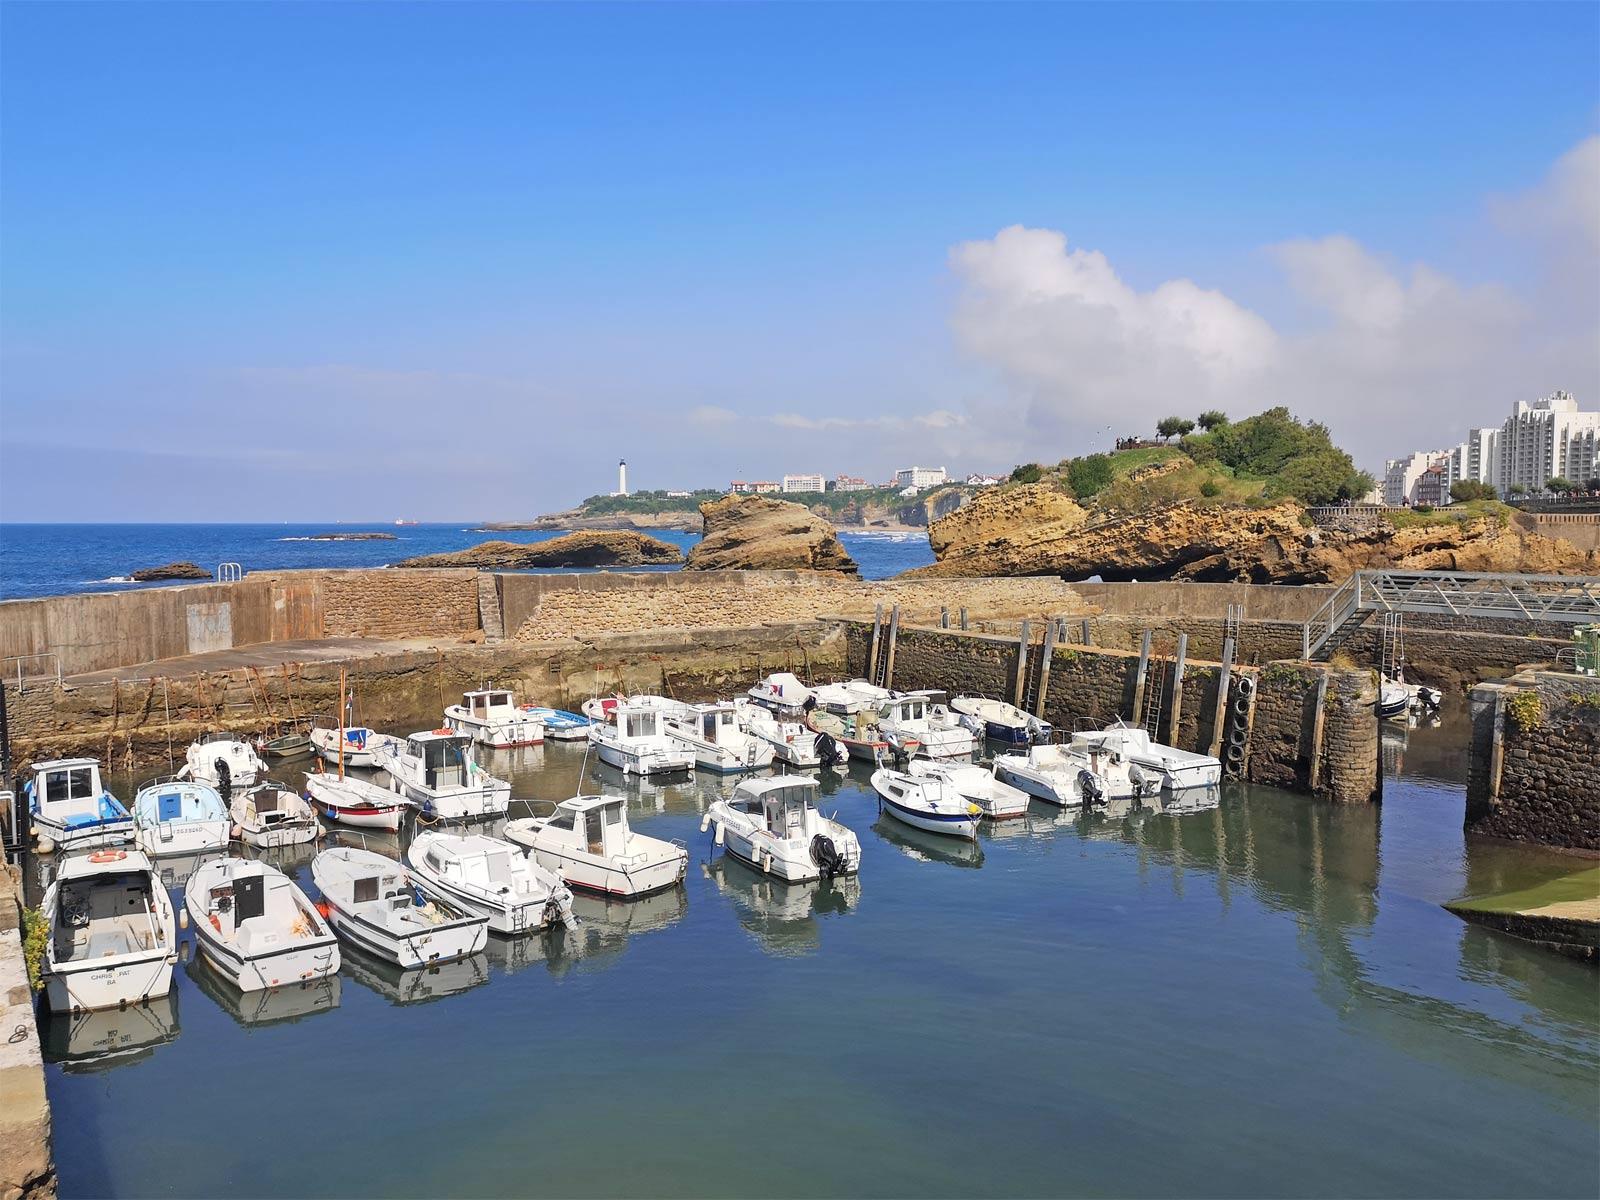 Vieux port Biarritz